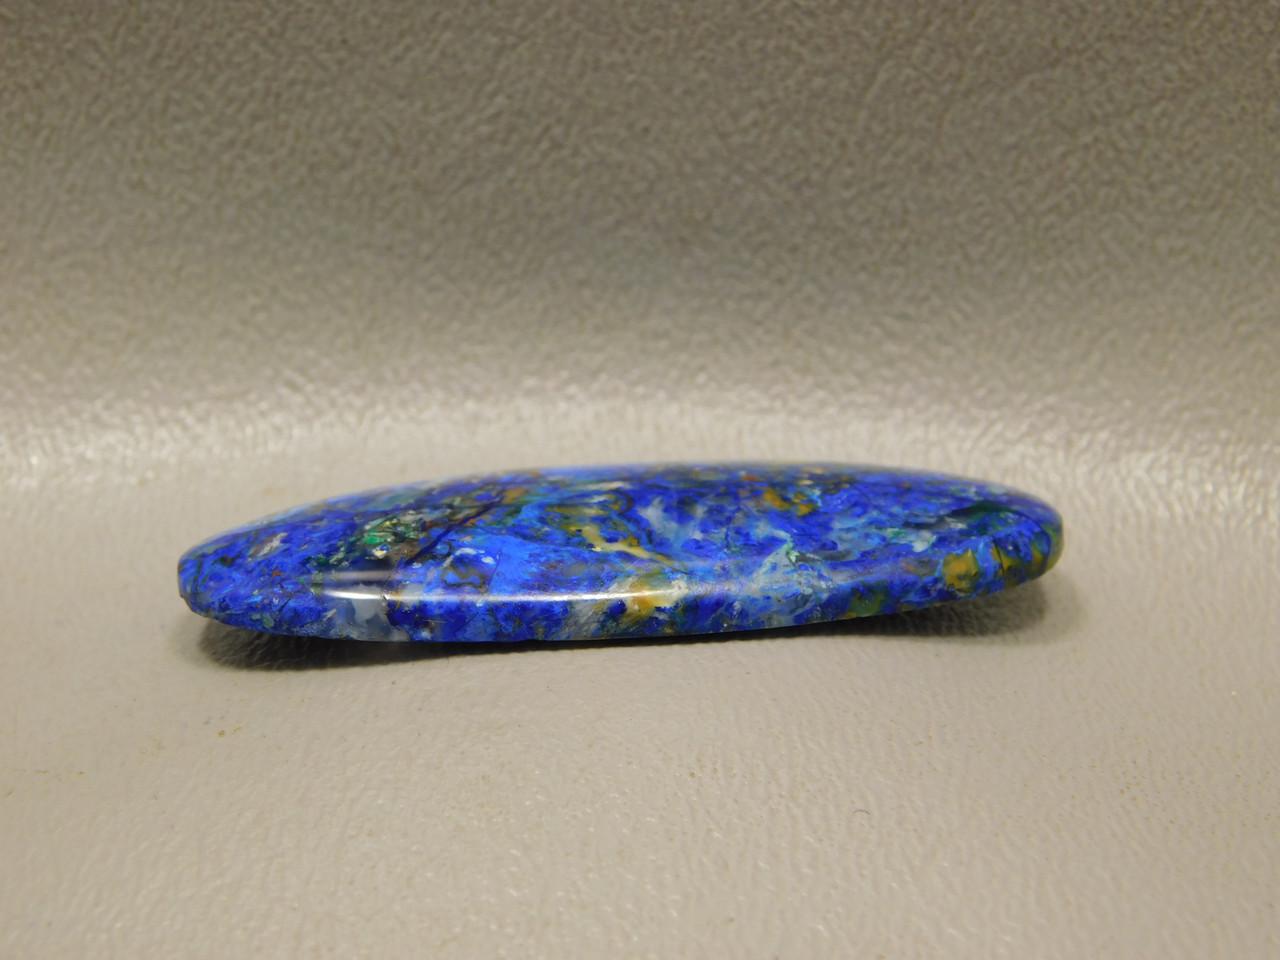 Azurite Malachite Bluebird Arizona Blue Stone Thin Oval Cabochon #23